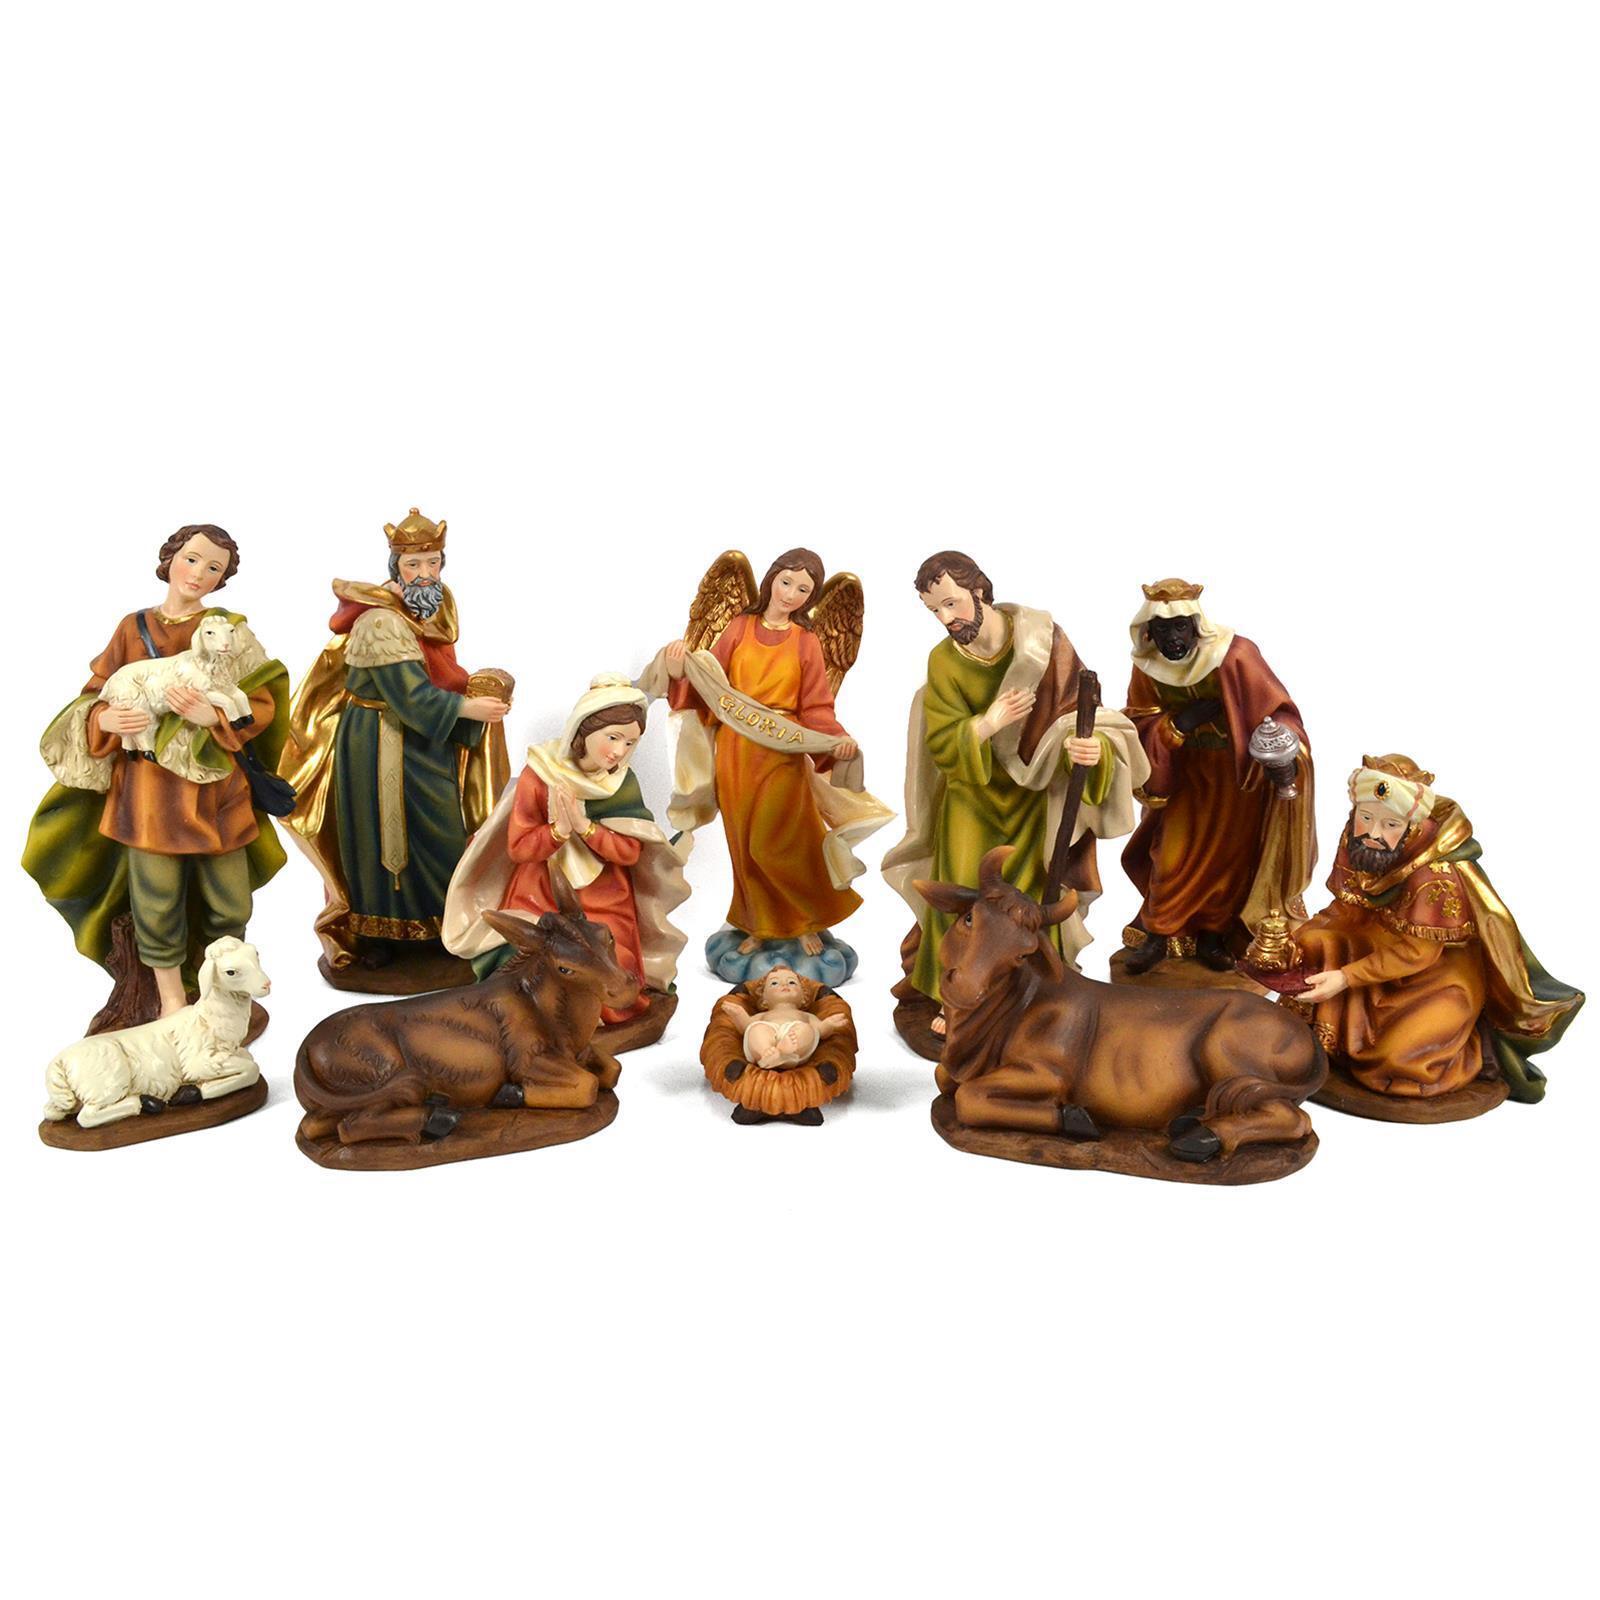 SET 11 PEZZI H 20 CM NATIVITA' STATUE PRESEPE PERSONAGGI PRESEPIO MESTIERI MESTI